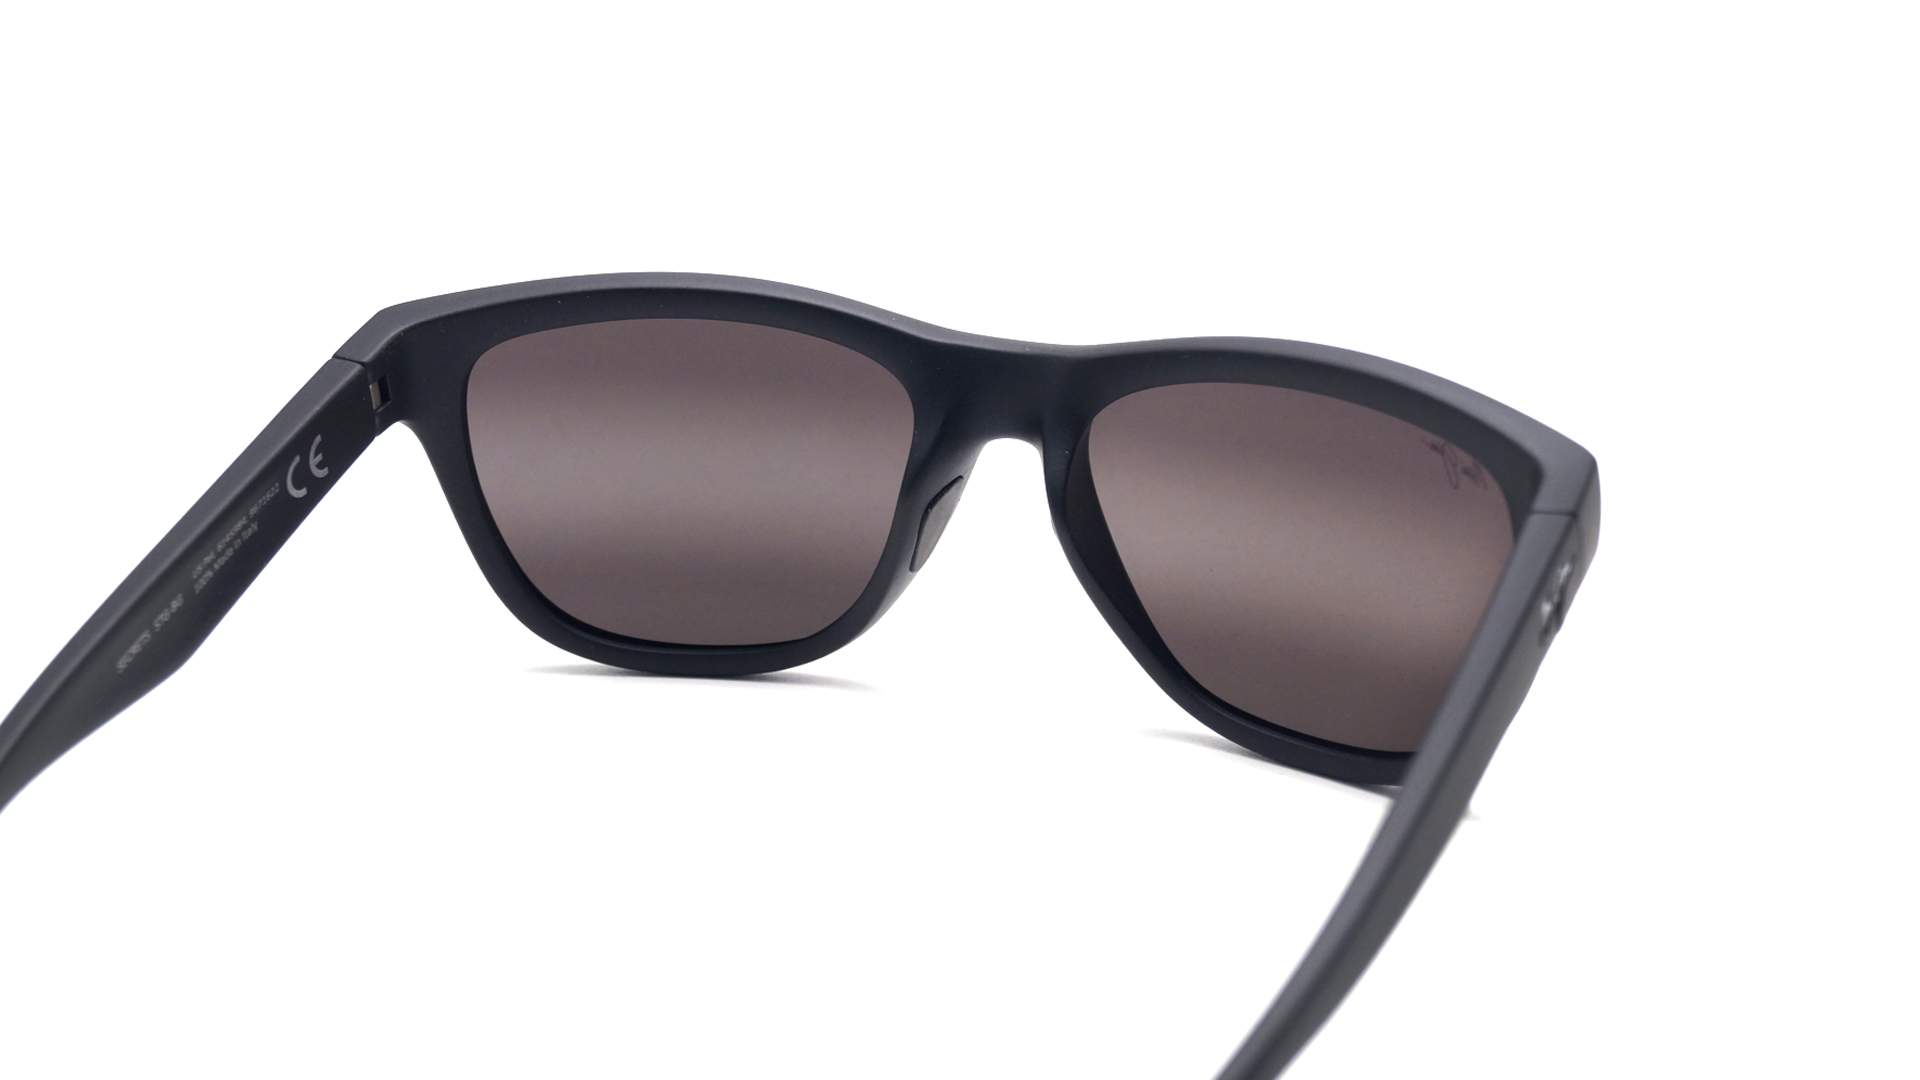 60f845dcc9 Sunglasses Maui Jim Secrets Black Matte Super thin glass 7672M Polarized  Gradient